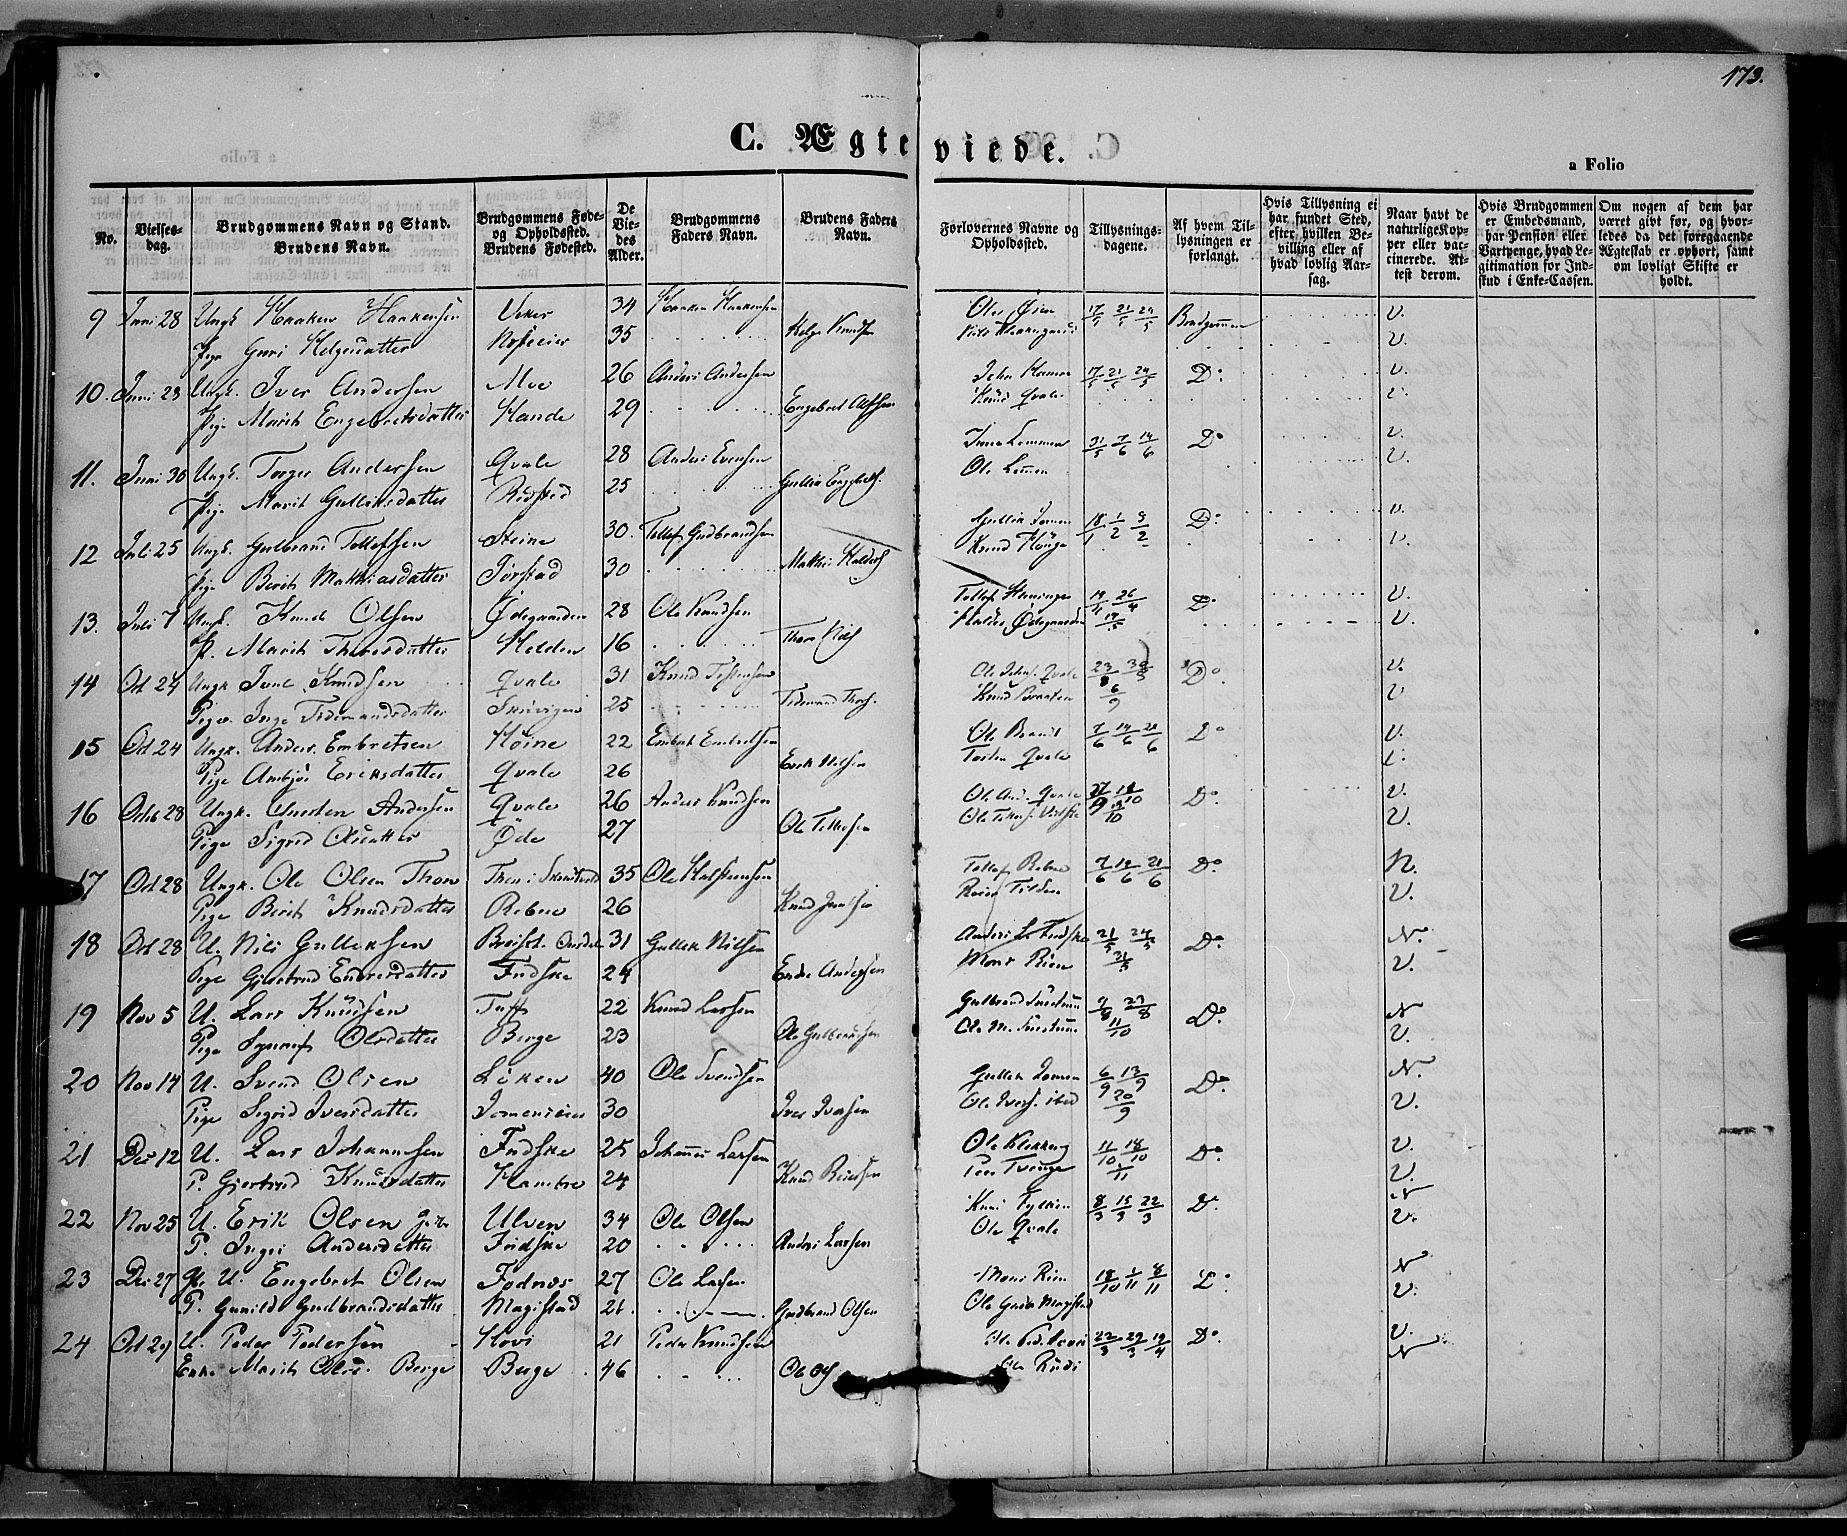 SAH, Vestre Slidre prestekontor, Ministerialbok nr. 1, 1844-1855, s. 173